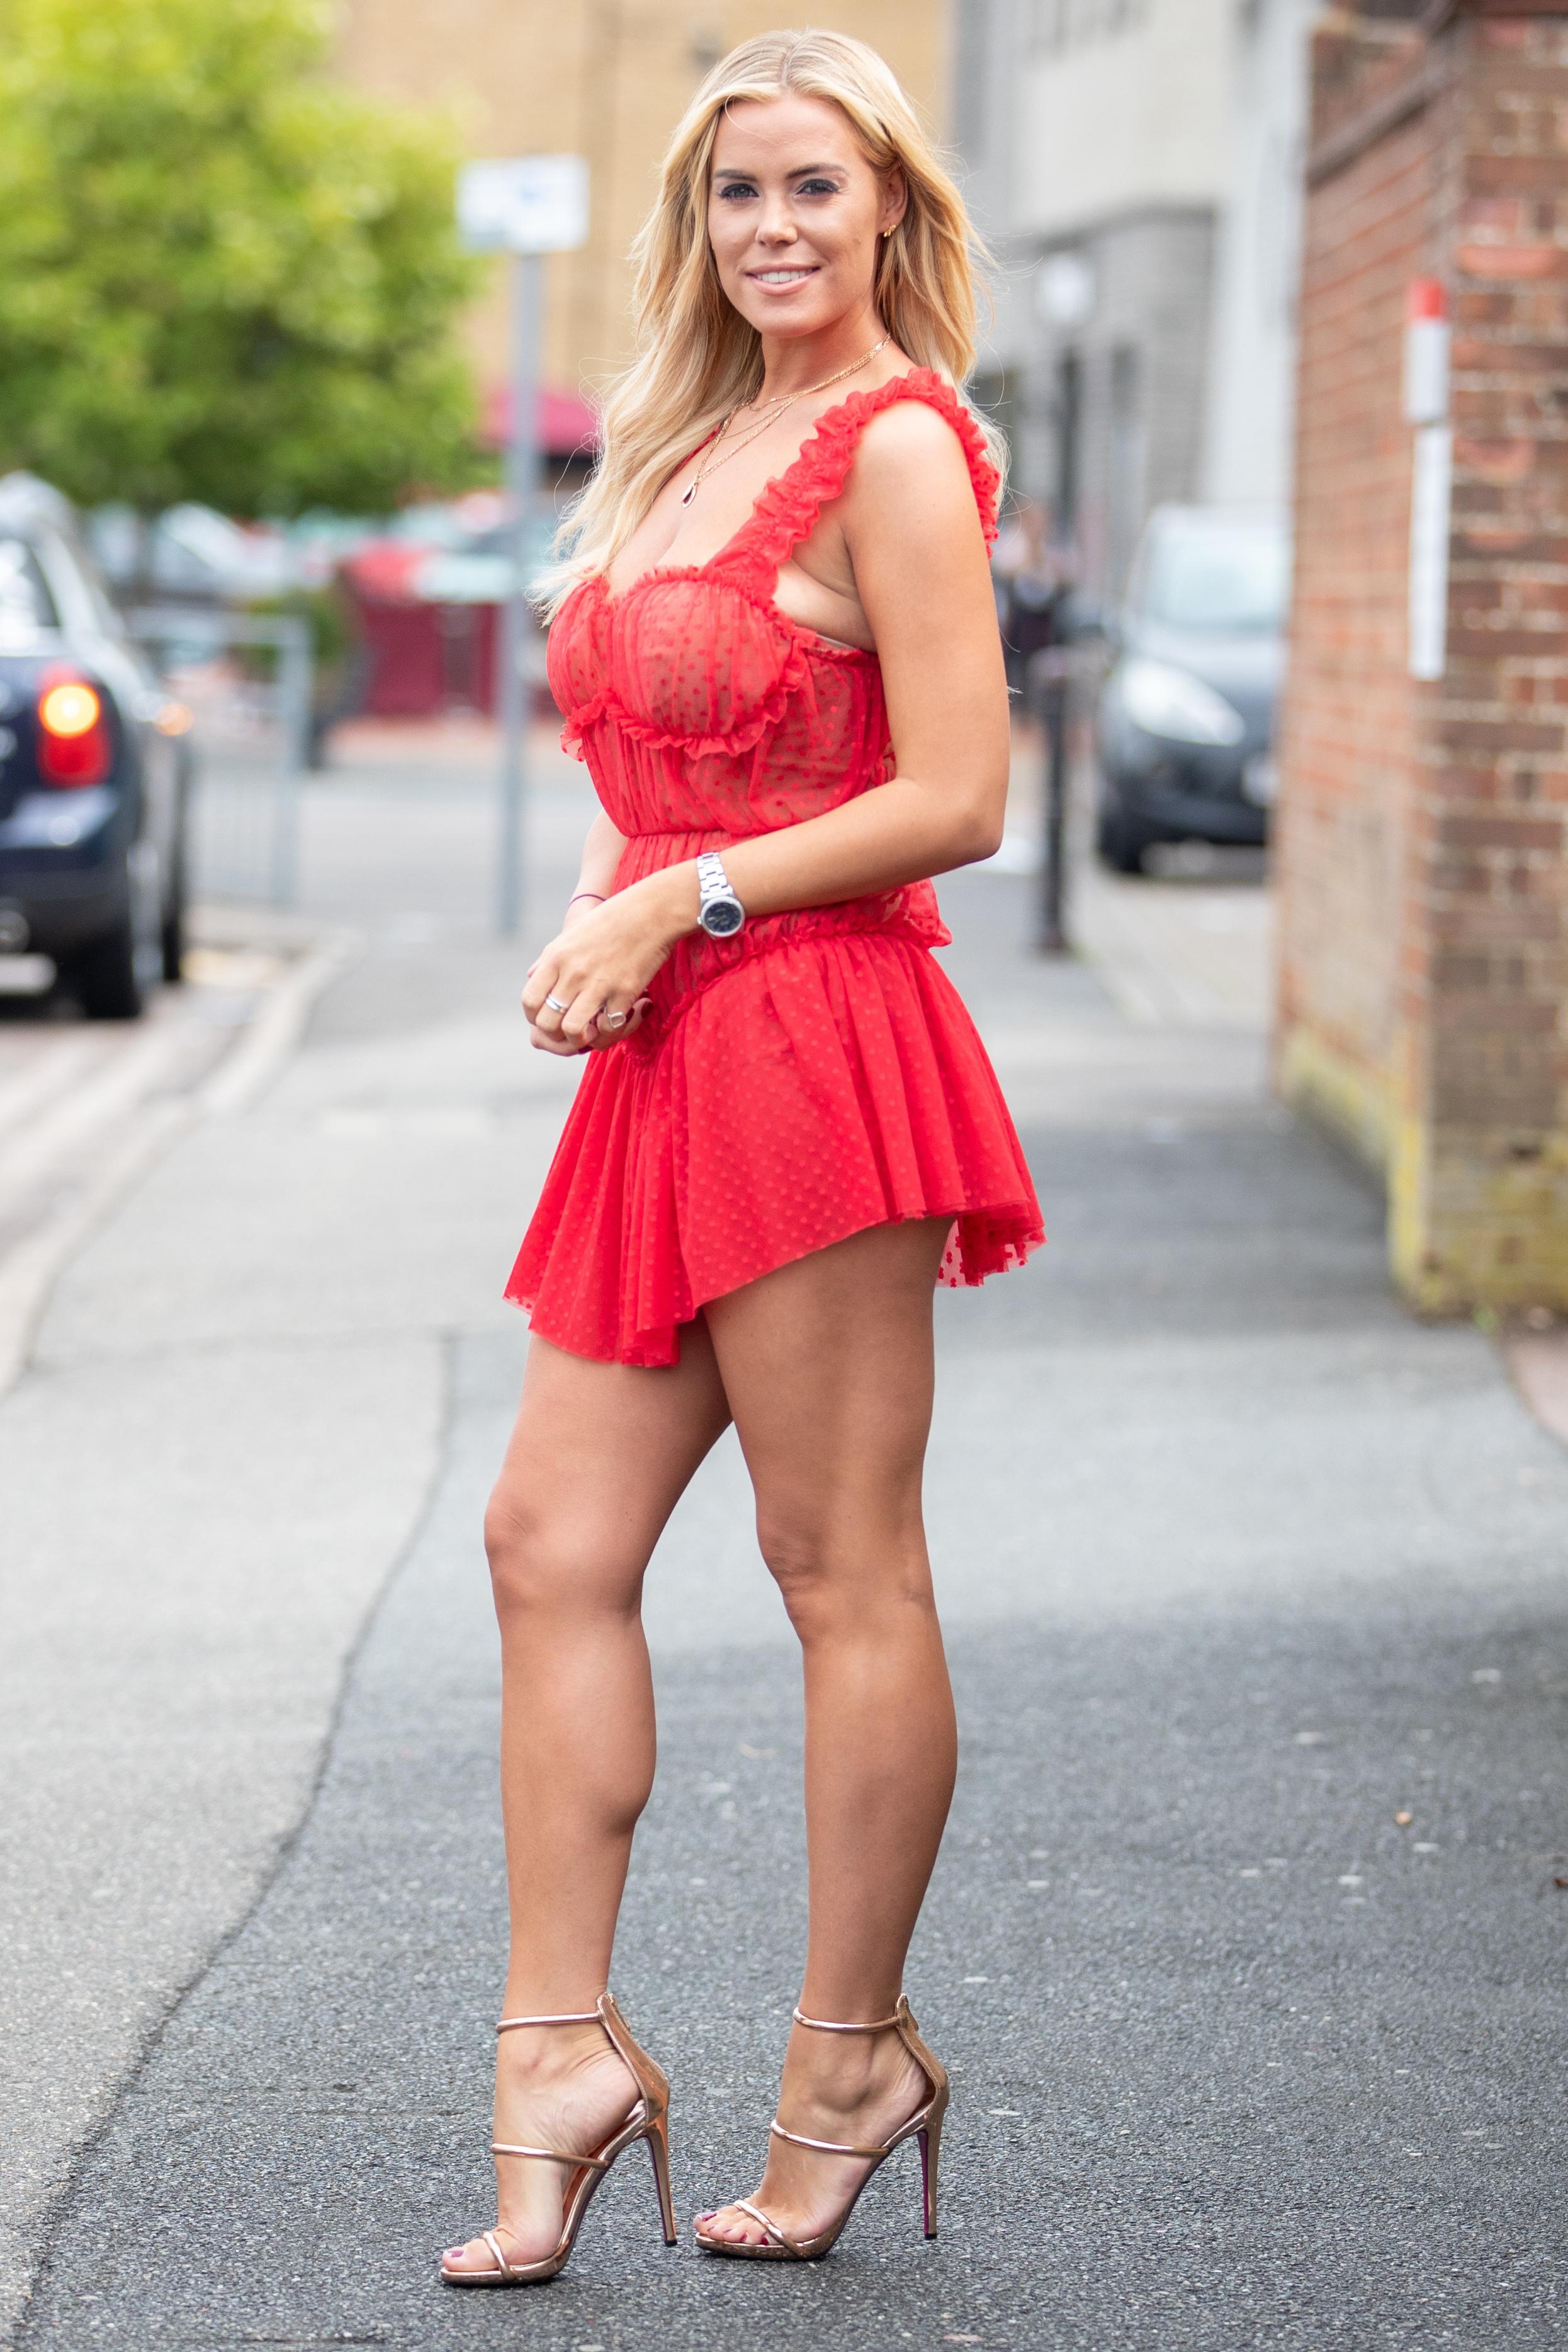 Sexy Chloe Meadows  nude (91 fotos), Twitter, butt